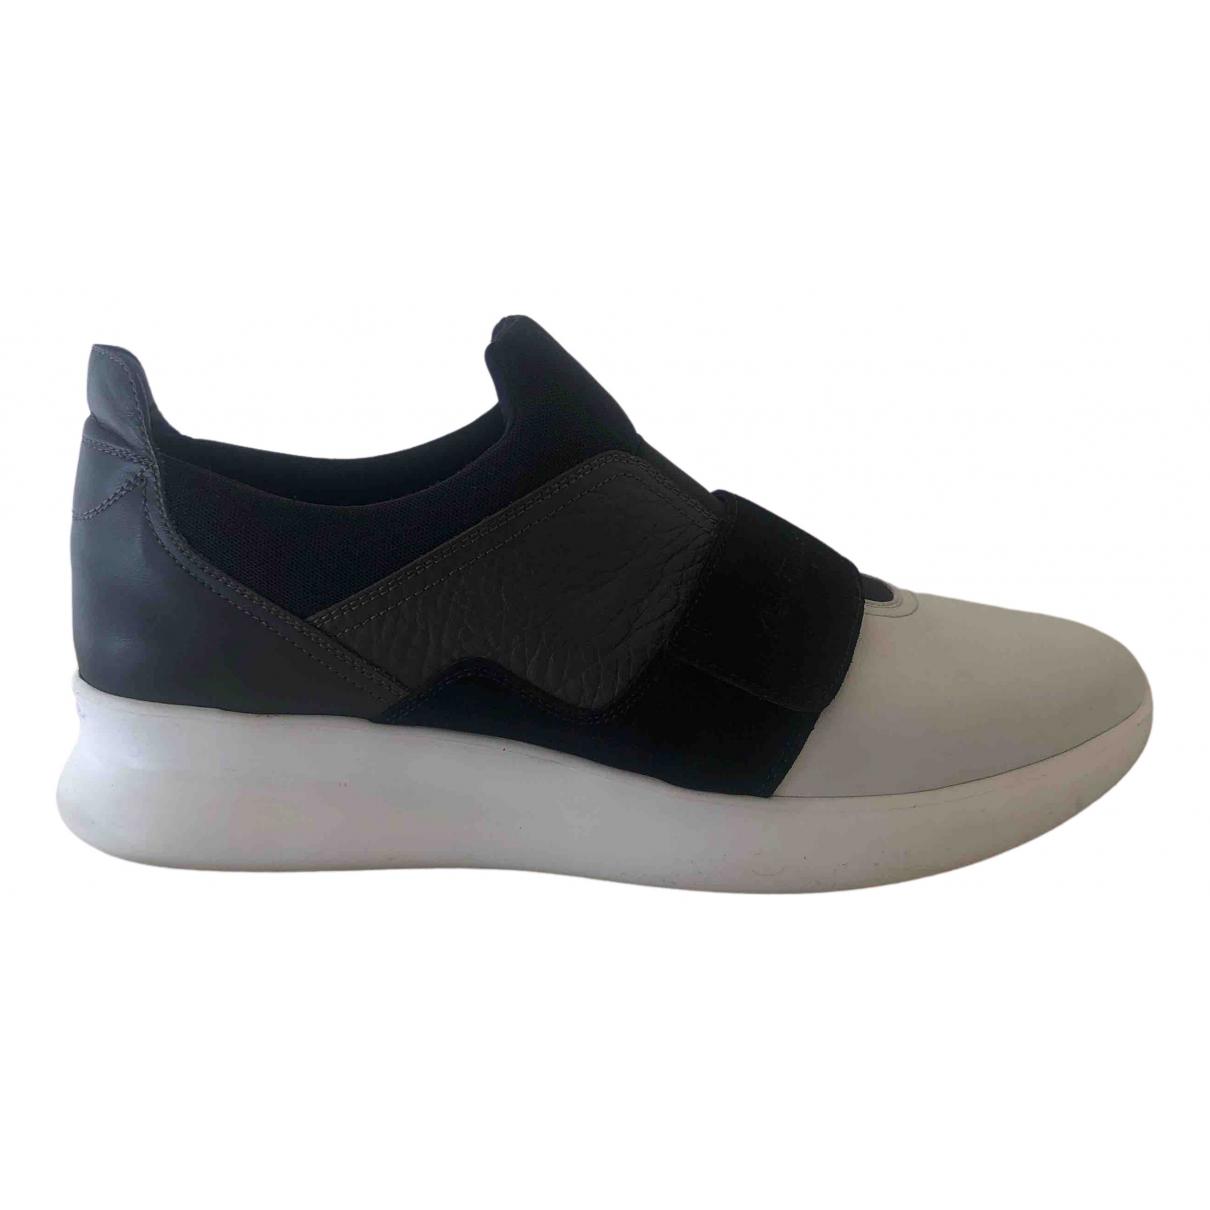 Salvatore Ferragamo \N Sneakers in  Schwarz Leder